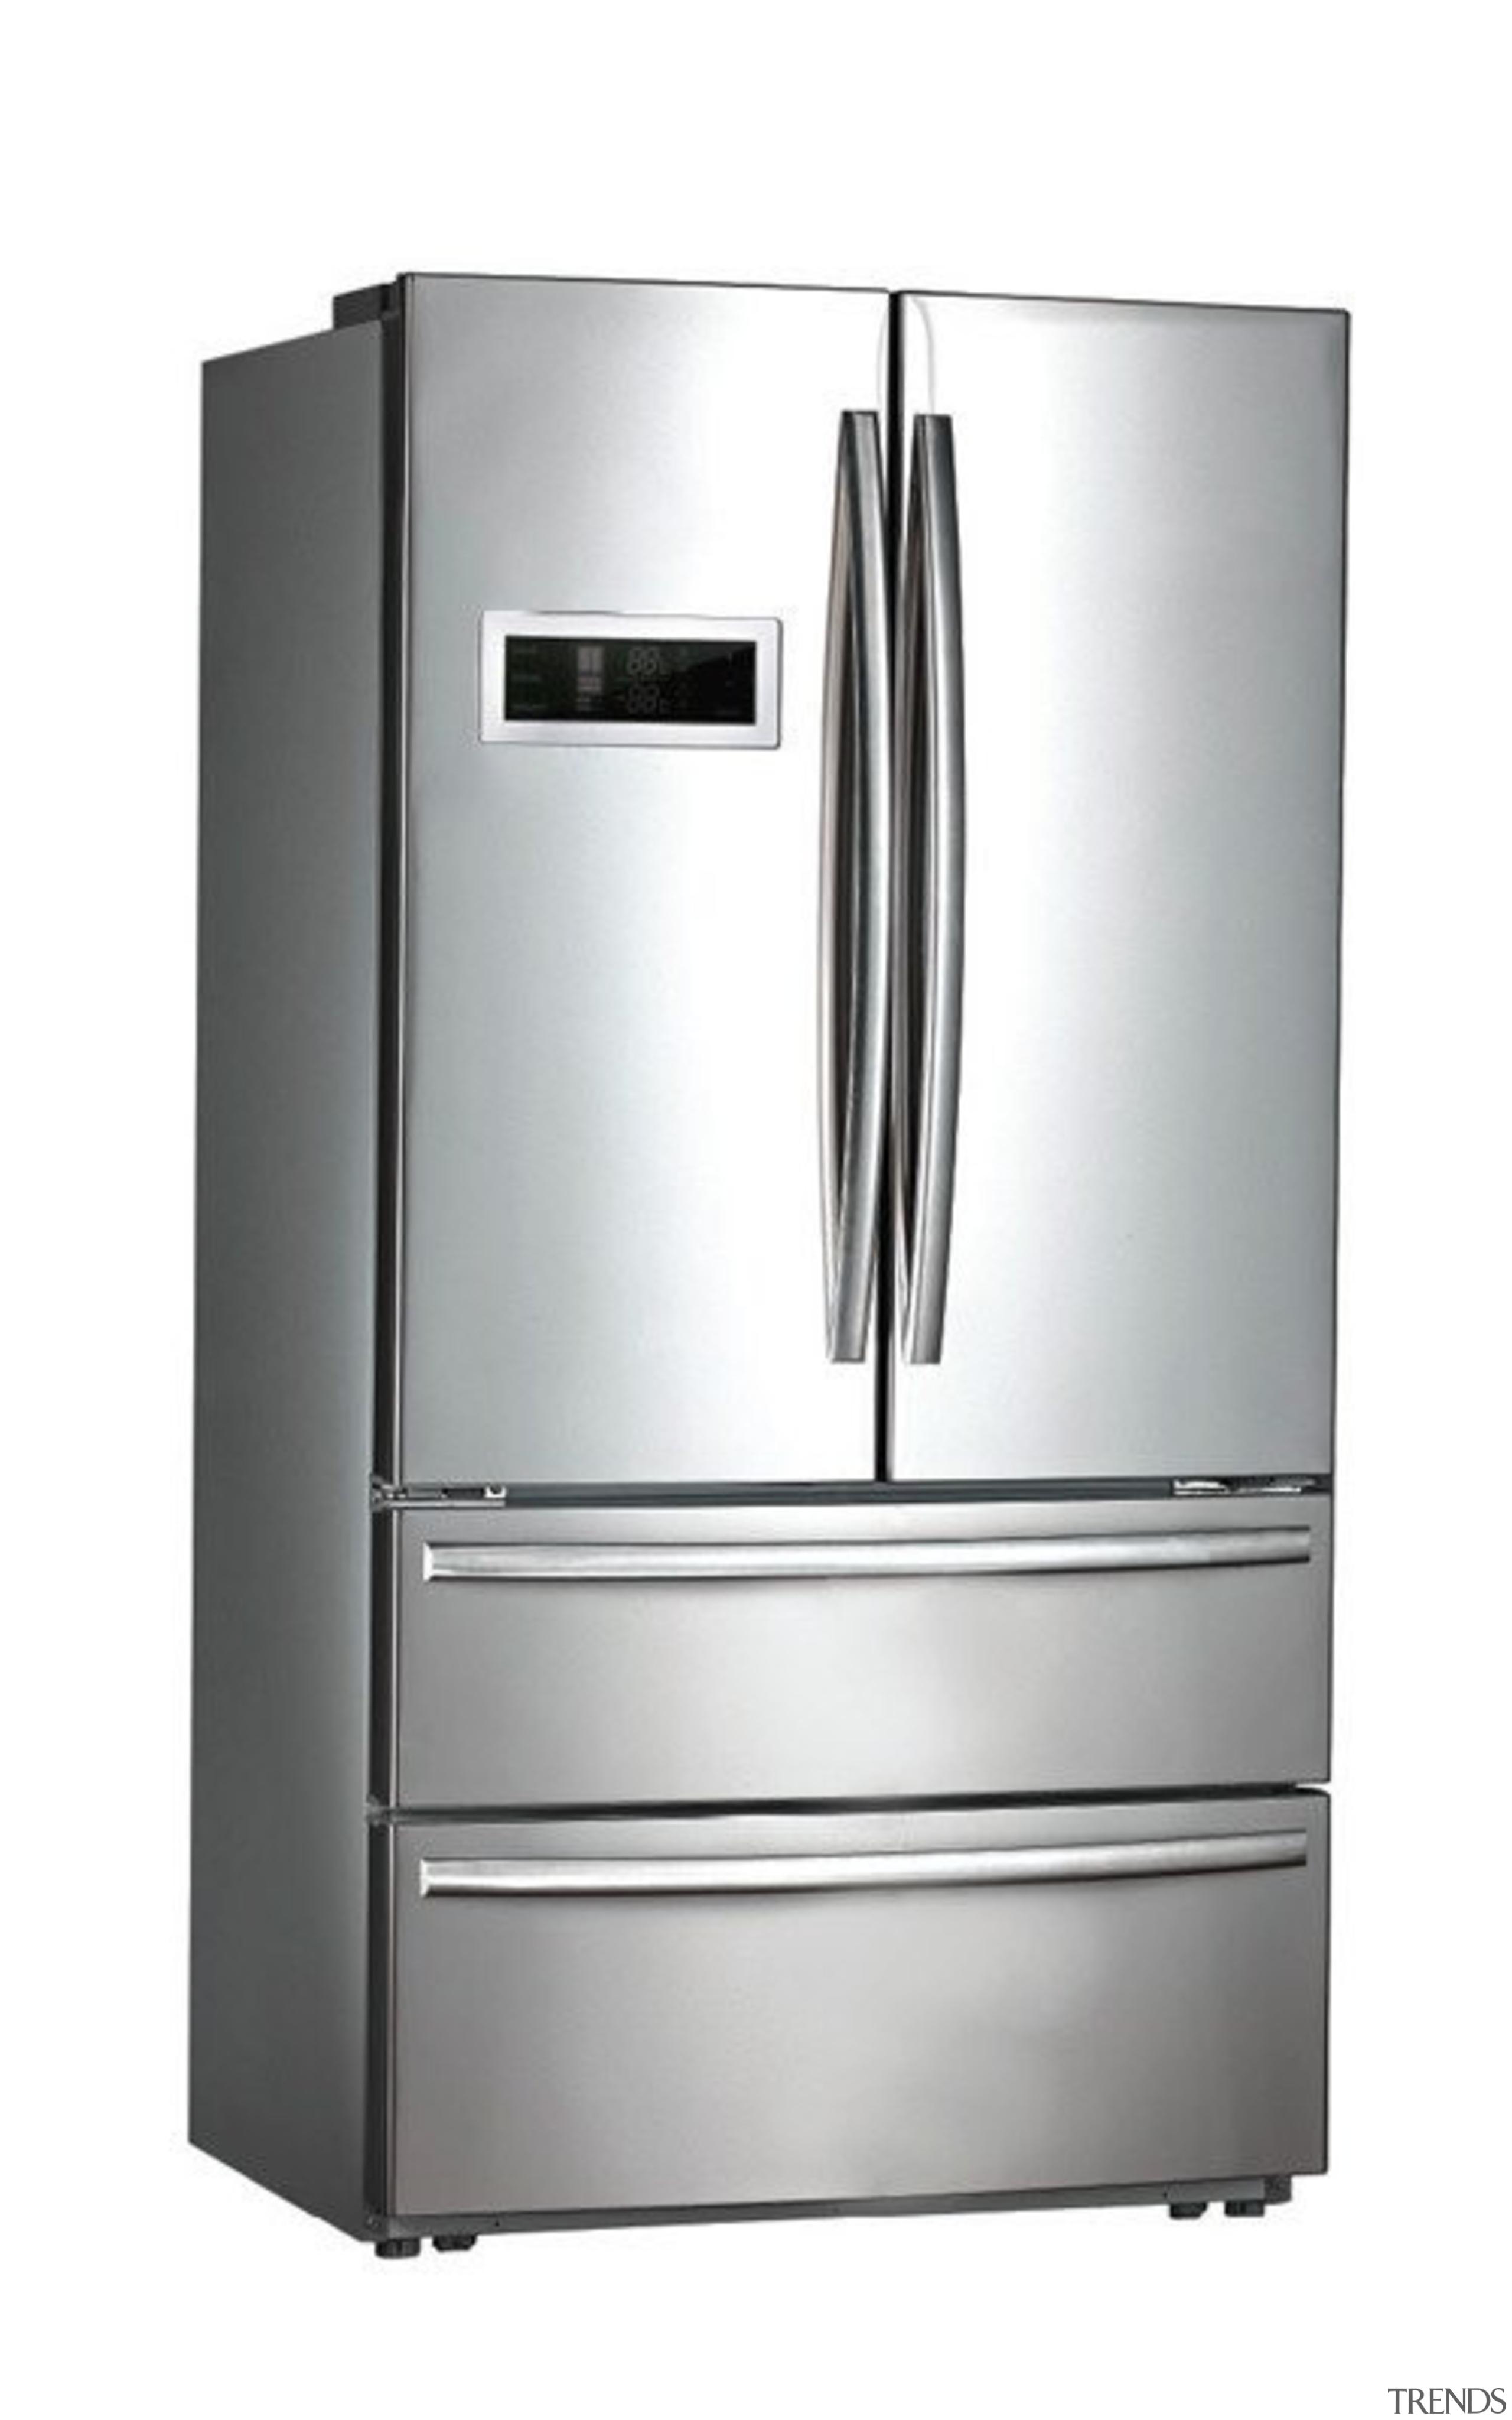 635L French Door Fridge FreezerGross Capacity: 635L445L Fridge home appliance, kitchen appliance, major appliance, product, product design, refrigerator, white